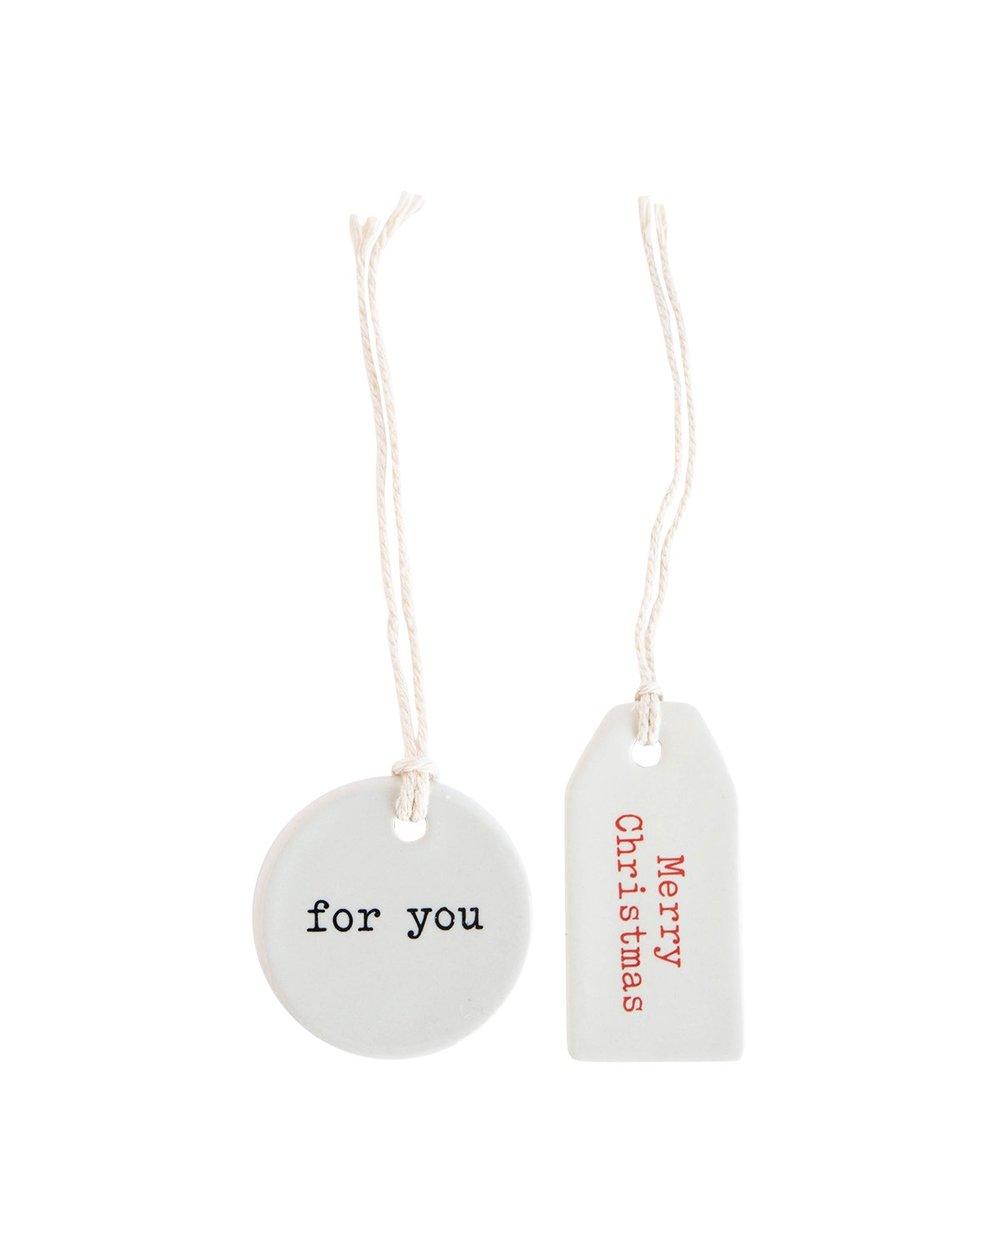 Stamped_Ceramic_Gift_Tags_3.jpg